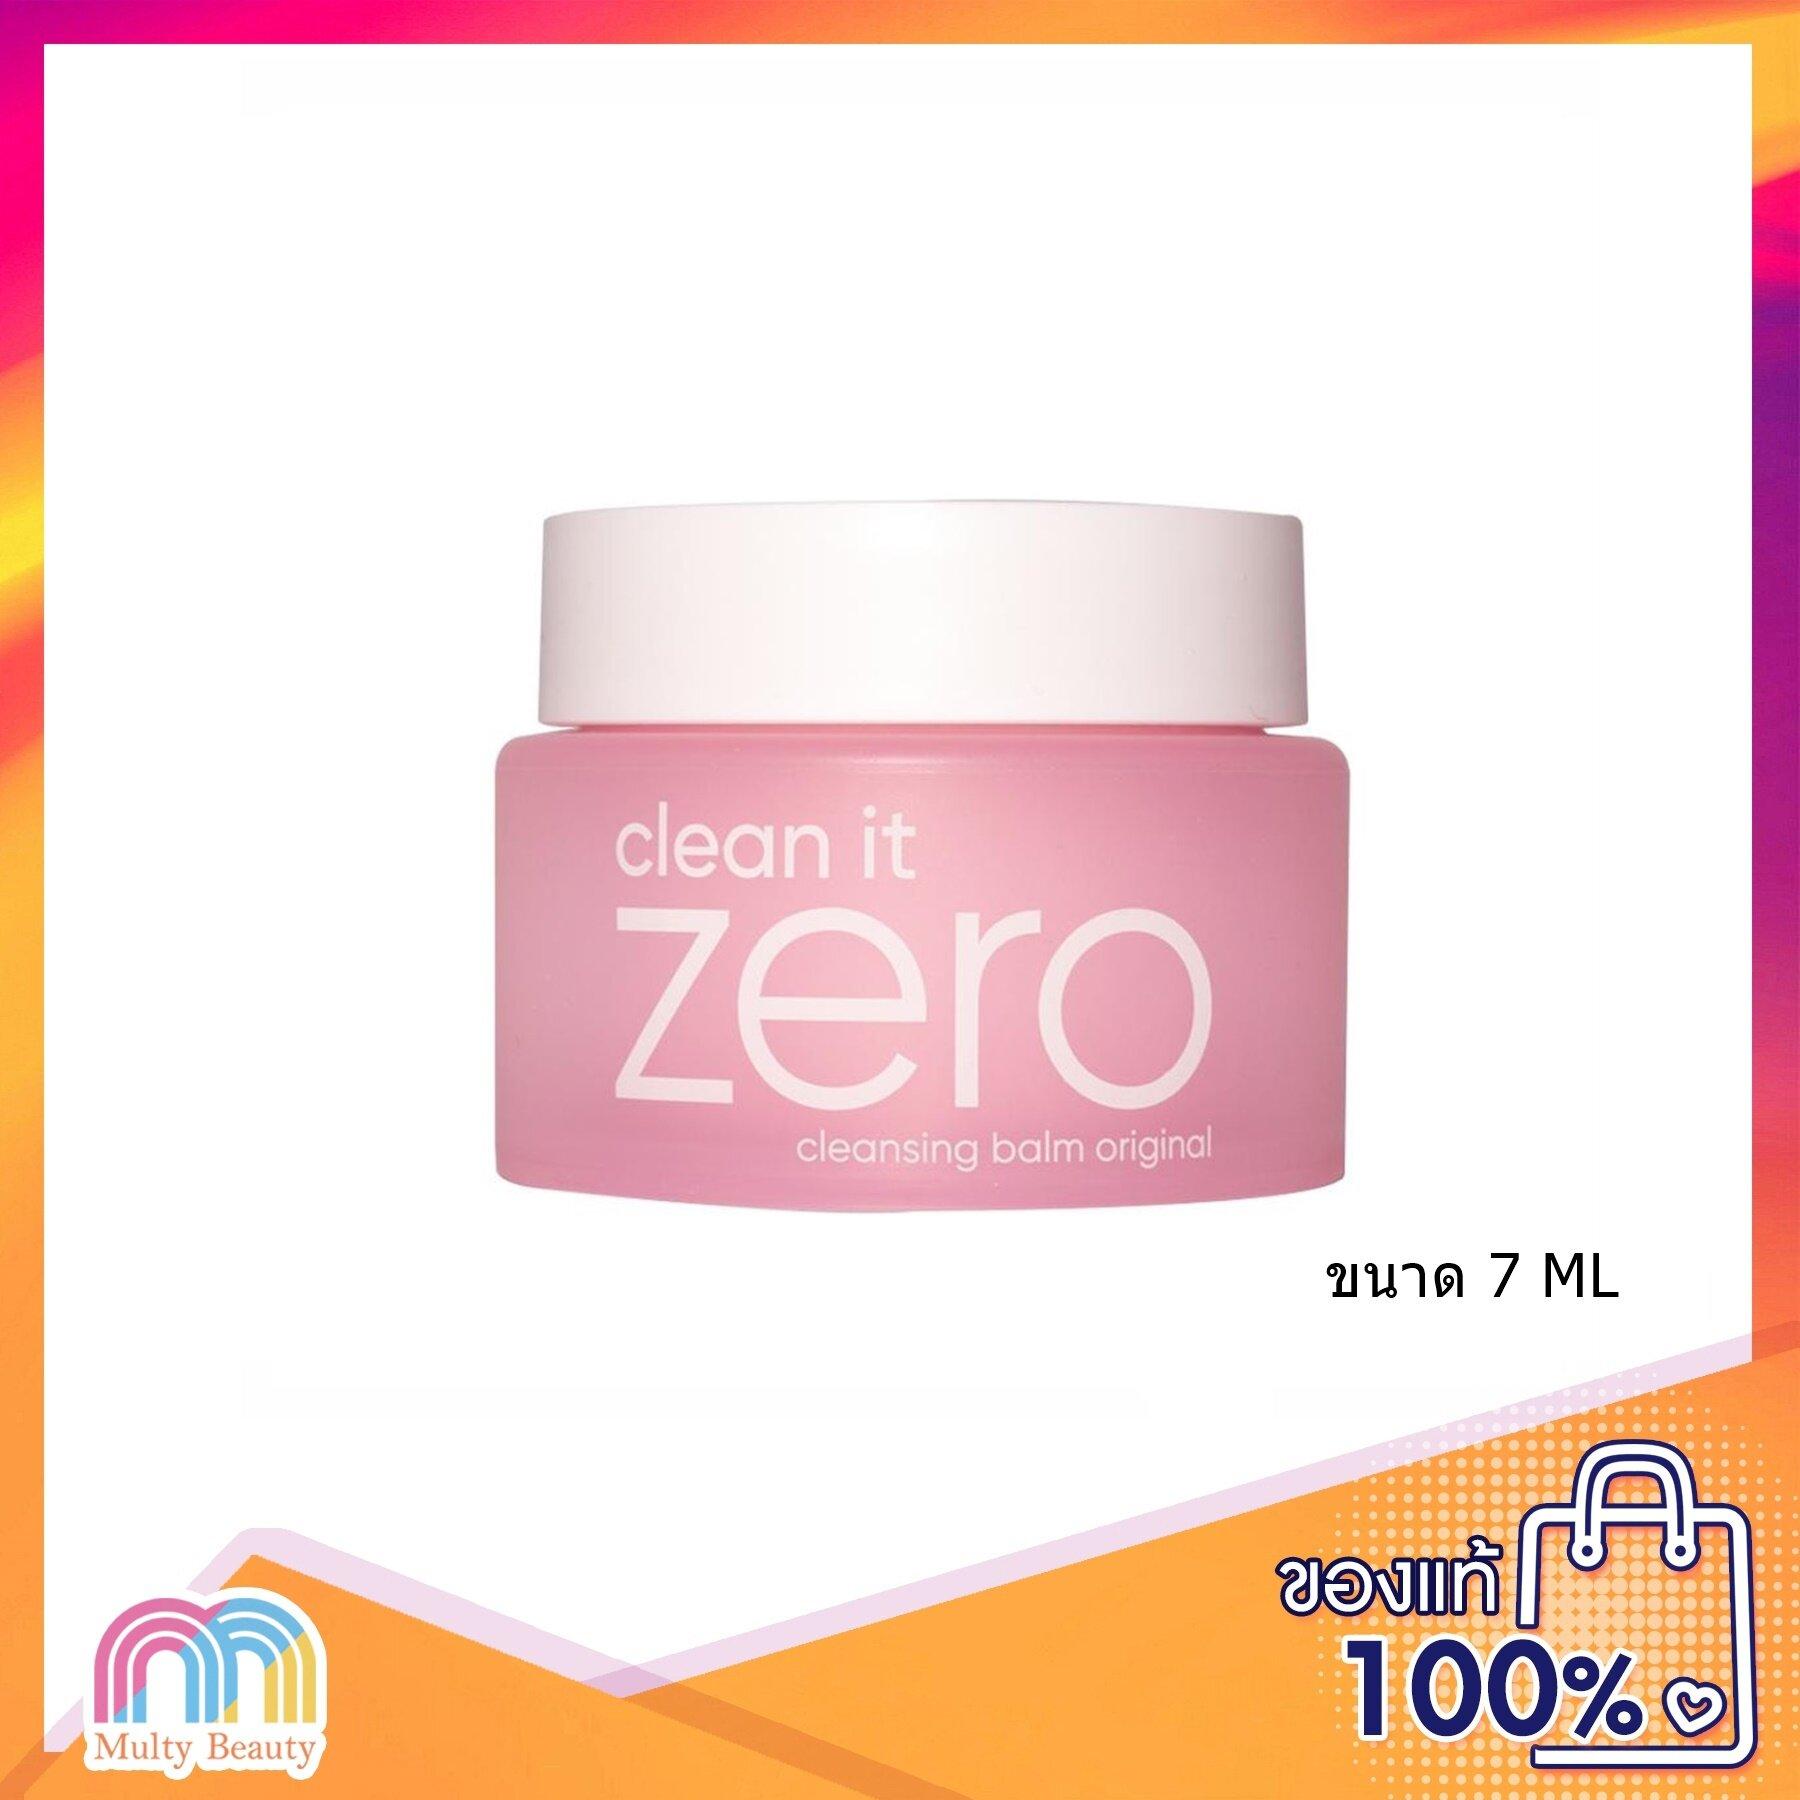 Multy Beauty Banila Co Clean It Zero Original คลีนซิ่งบาล์มเนื้อเชอร์เบทสูตรต้นตำรับ ขนาด 7 Ml.